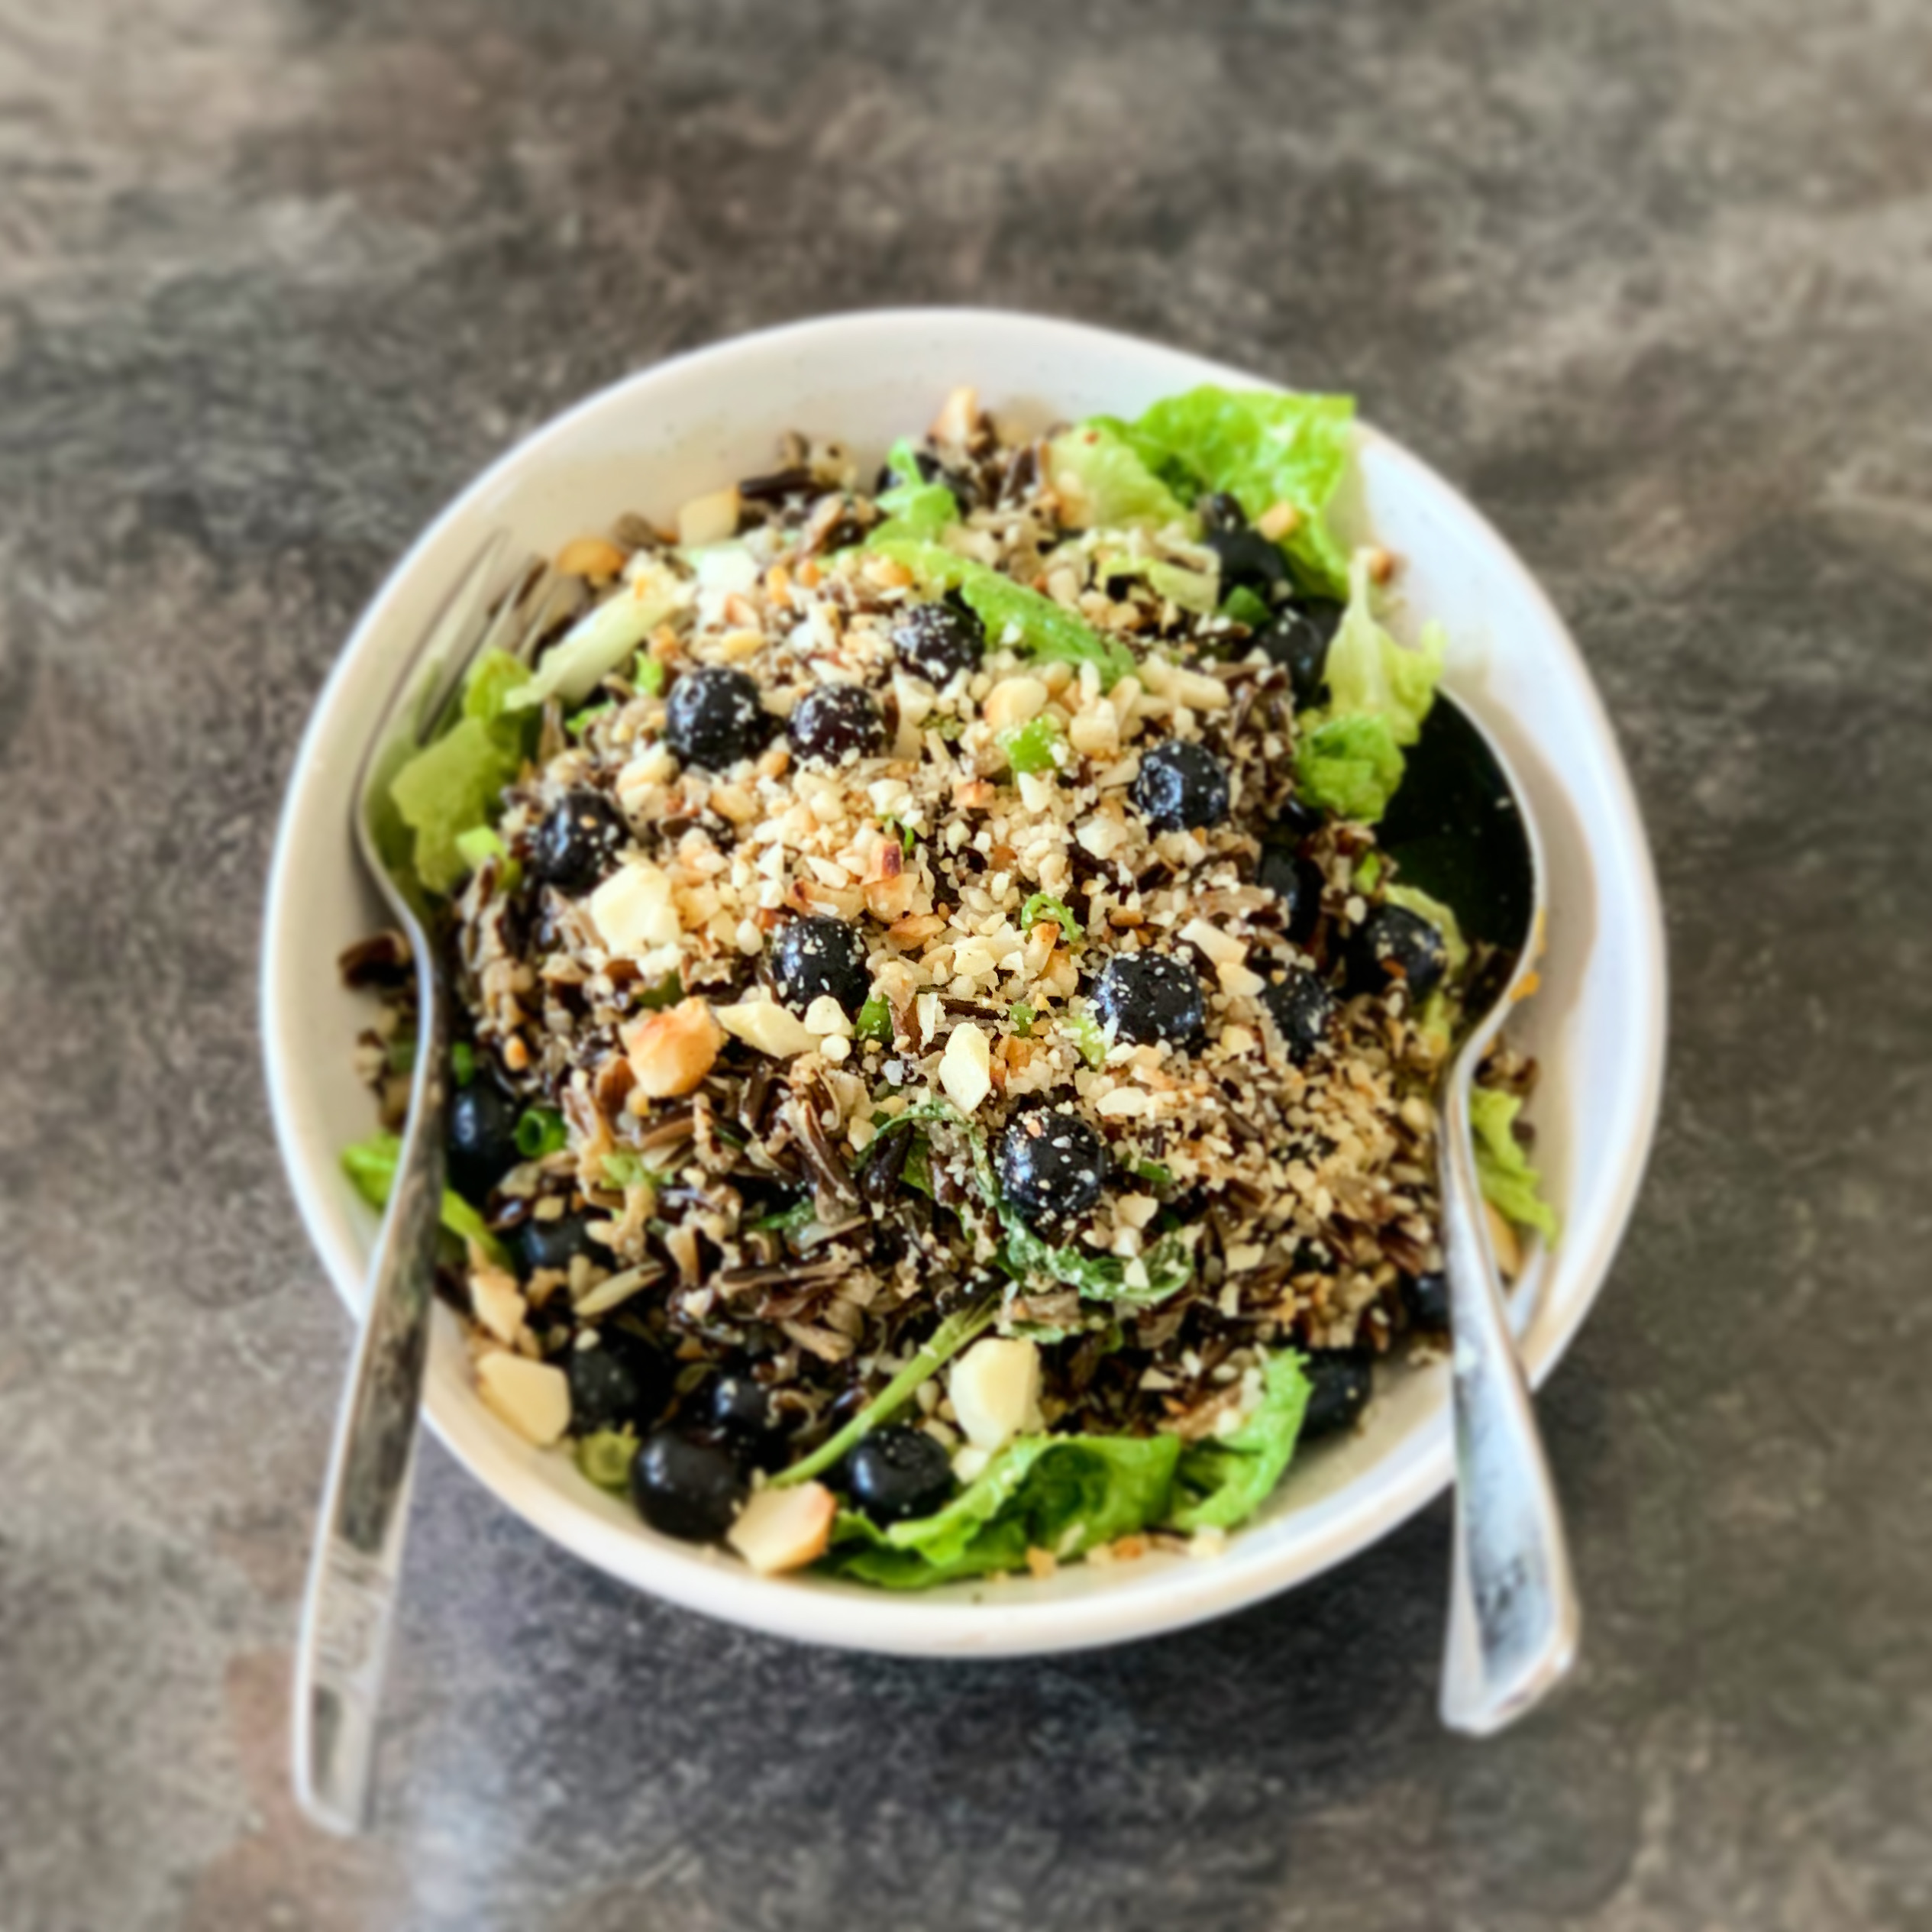 Blueberry, Macadamia & Wild Rice Salad